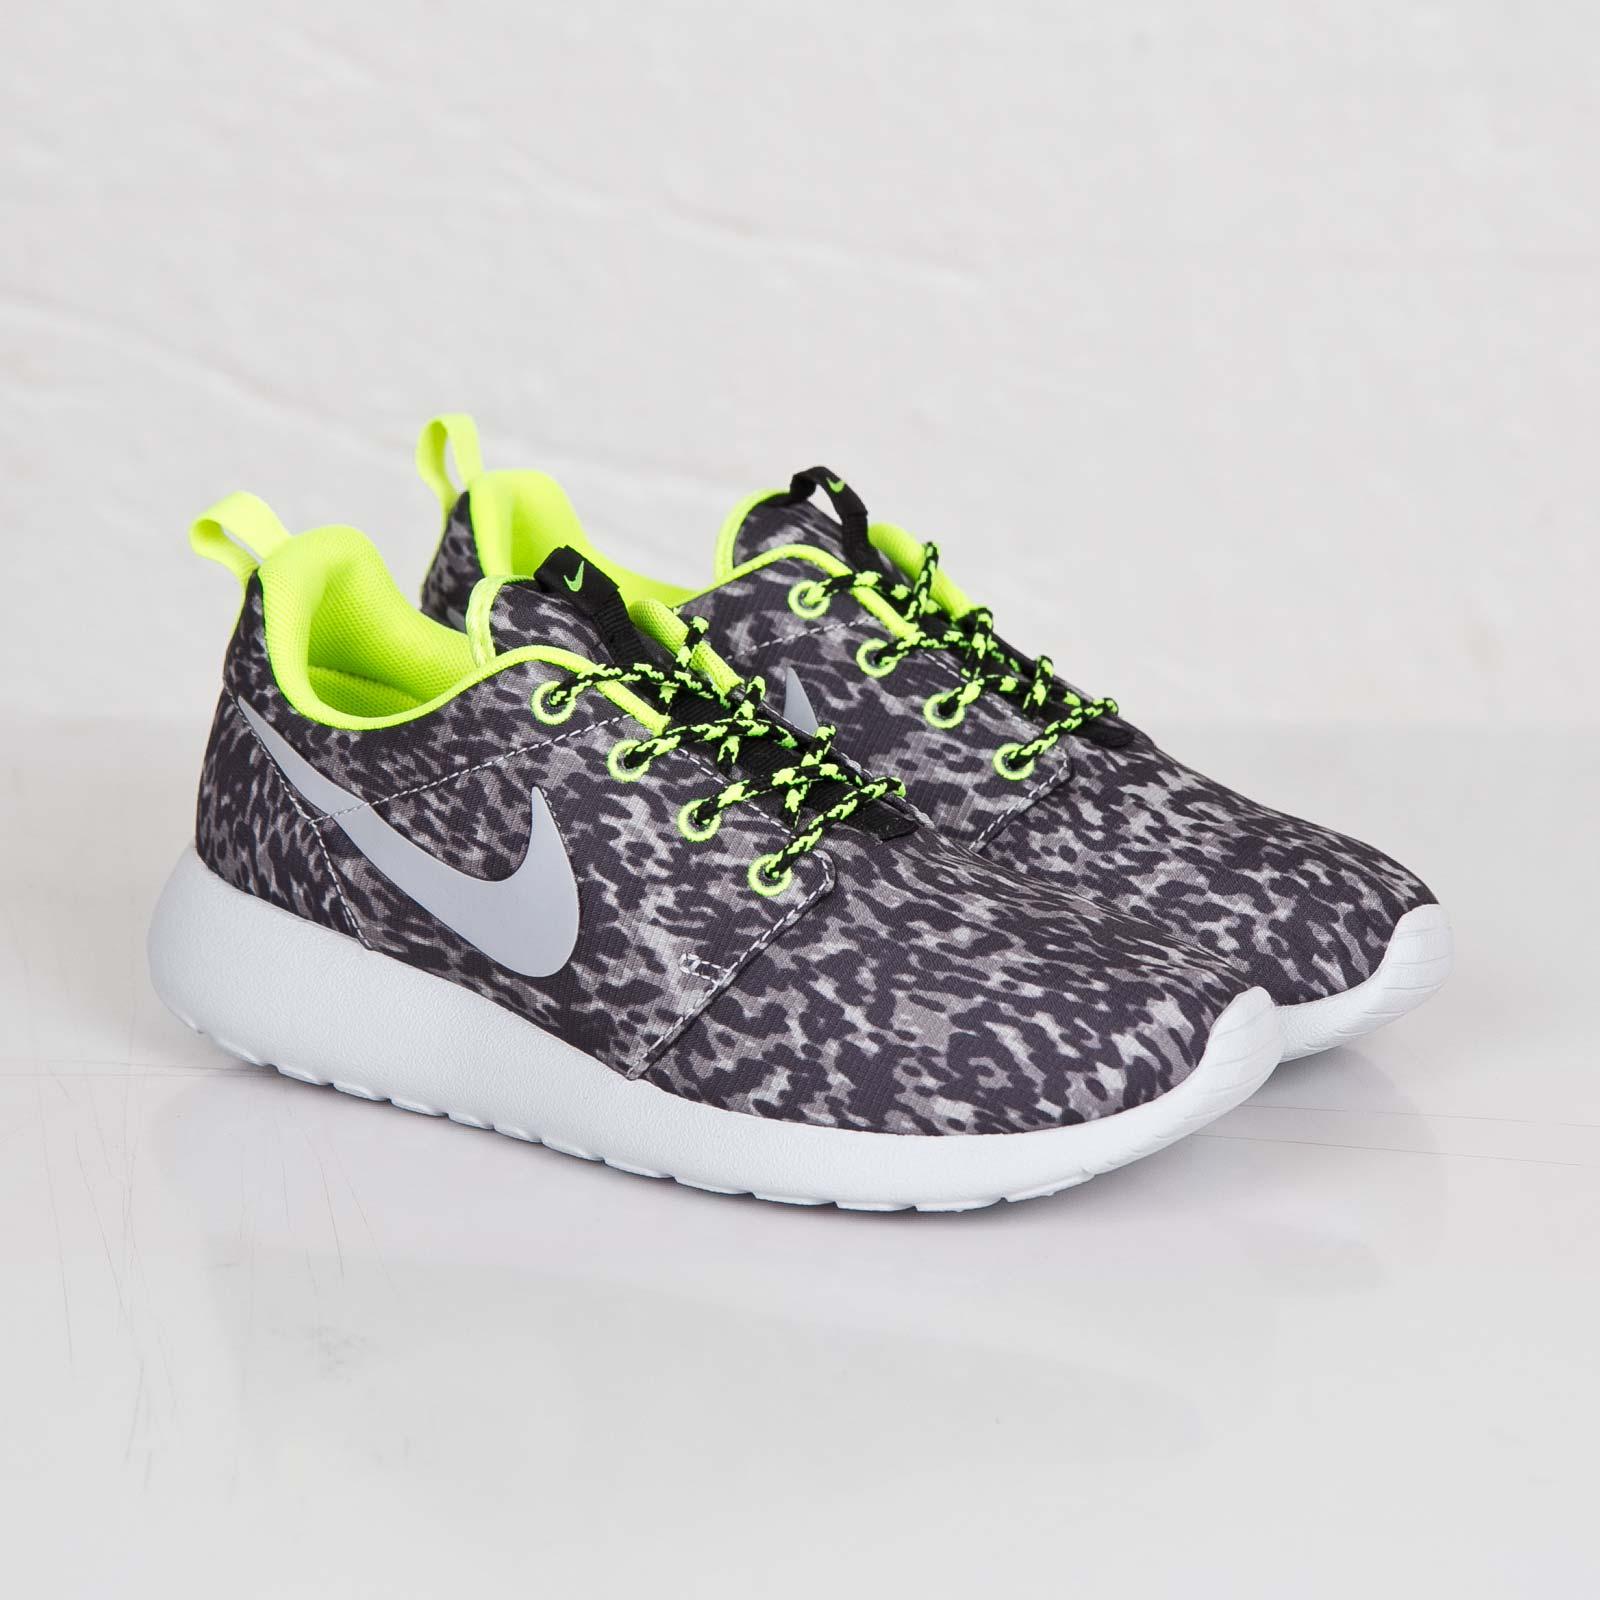 144681cf31d1 Nike Wmns Roshe Run Print - 599432-070 - Sneakersnstuff